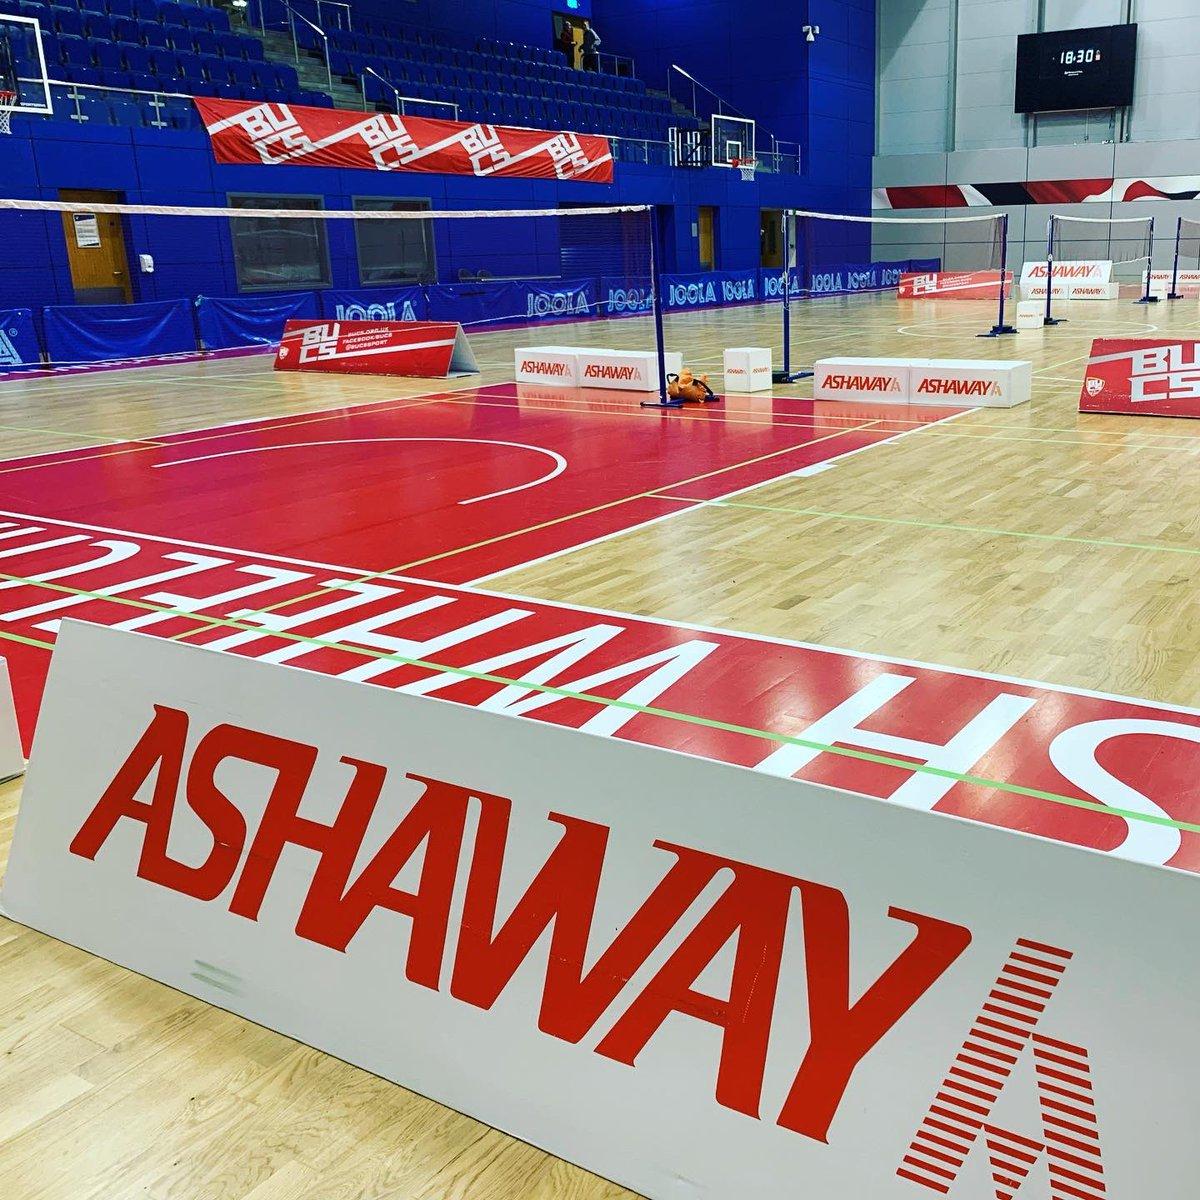 All set up for @BUCSsport nationals badminton championships! #badminton #badmintonplayer #badminton #badmintonlovers #badmintonlife #badmintontime #badmintonclub #badmintonlover #badmintonworld #badmintonracket #teamashaway #ashawaybadminton #ashawayracketpic.twitter.com/OdaluMzXny – at English Institute Of Sport